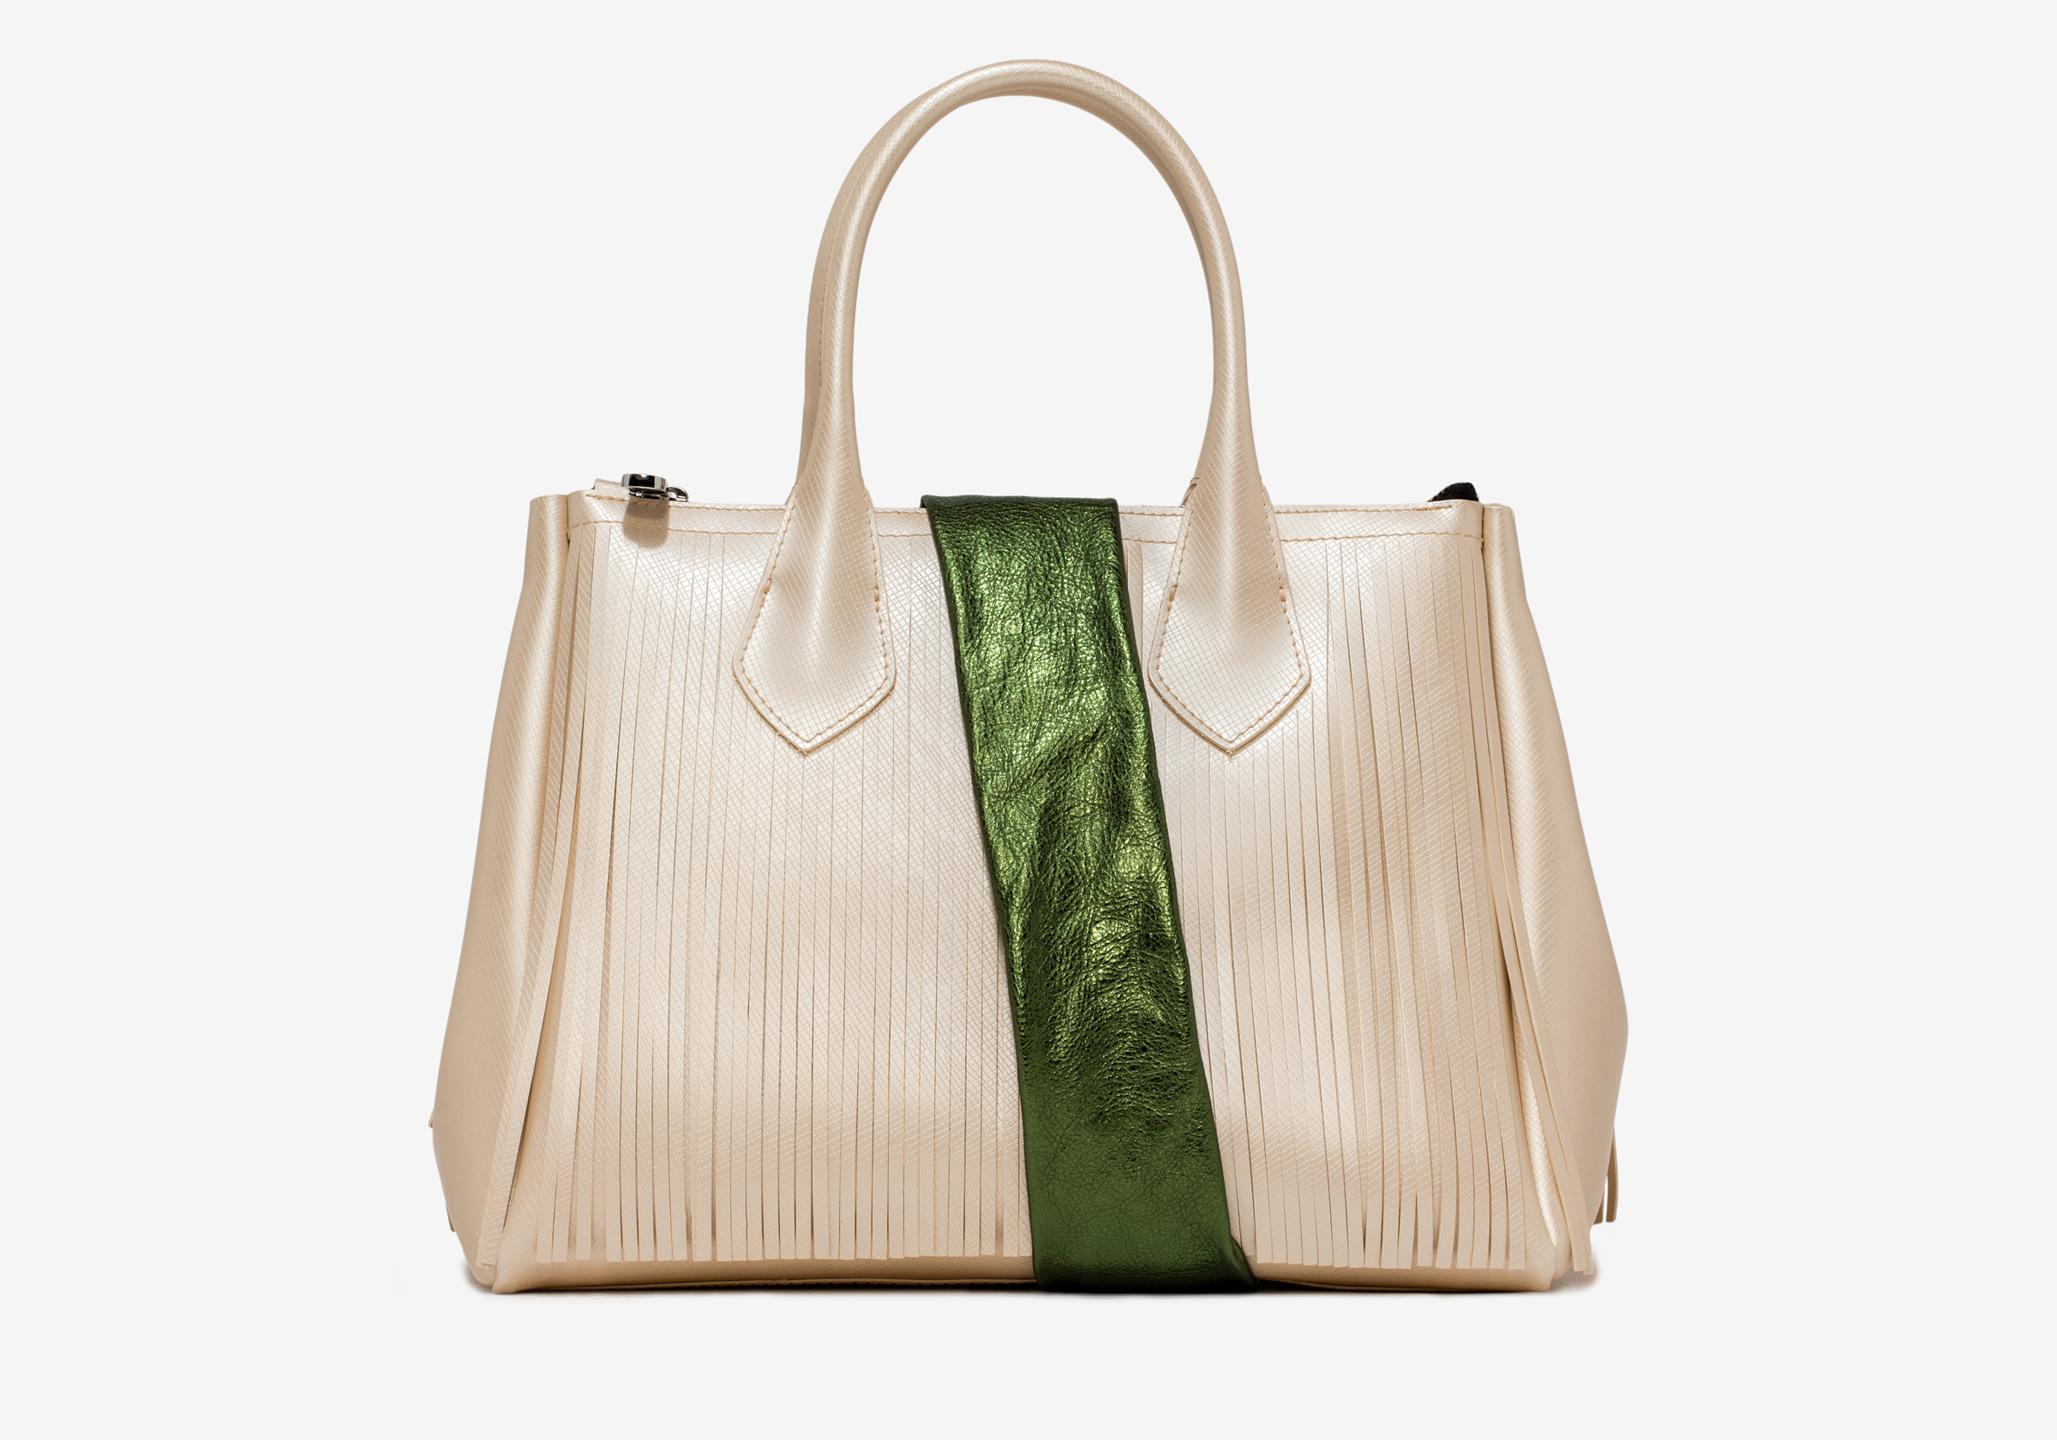 Strap Tr Gum Fixed Size 3865 Sash 7519pe Eco Leather AqaIPRTw